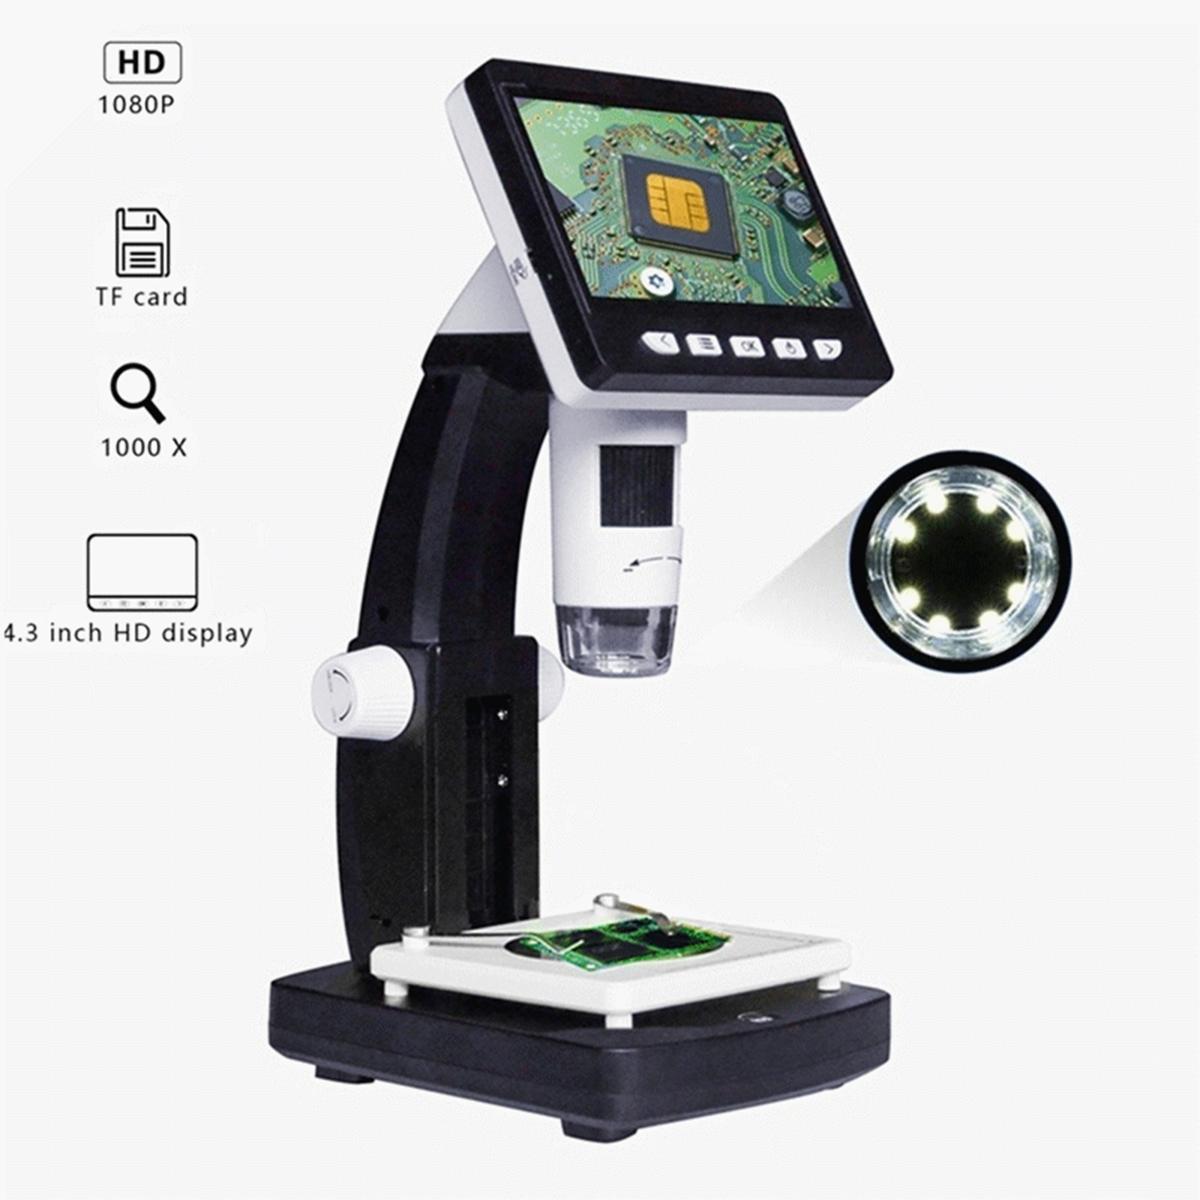 4.3'' 1000X HD 1080P Portable LCD Monitor Digital Video Microscope Magnifier Pro